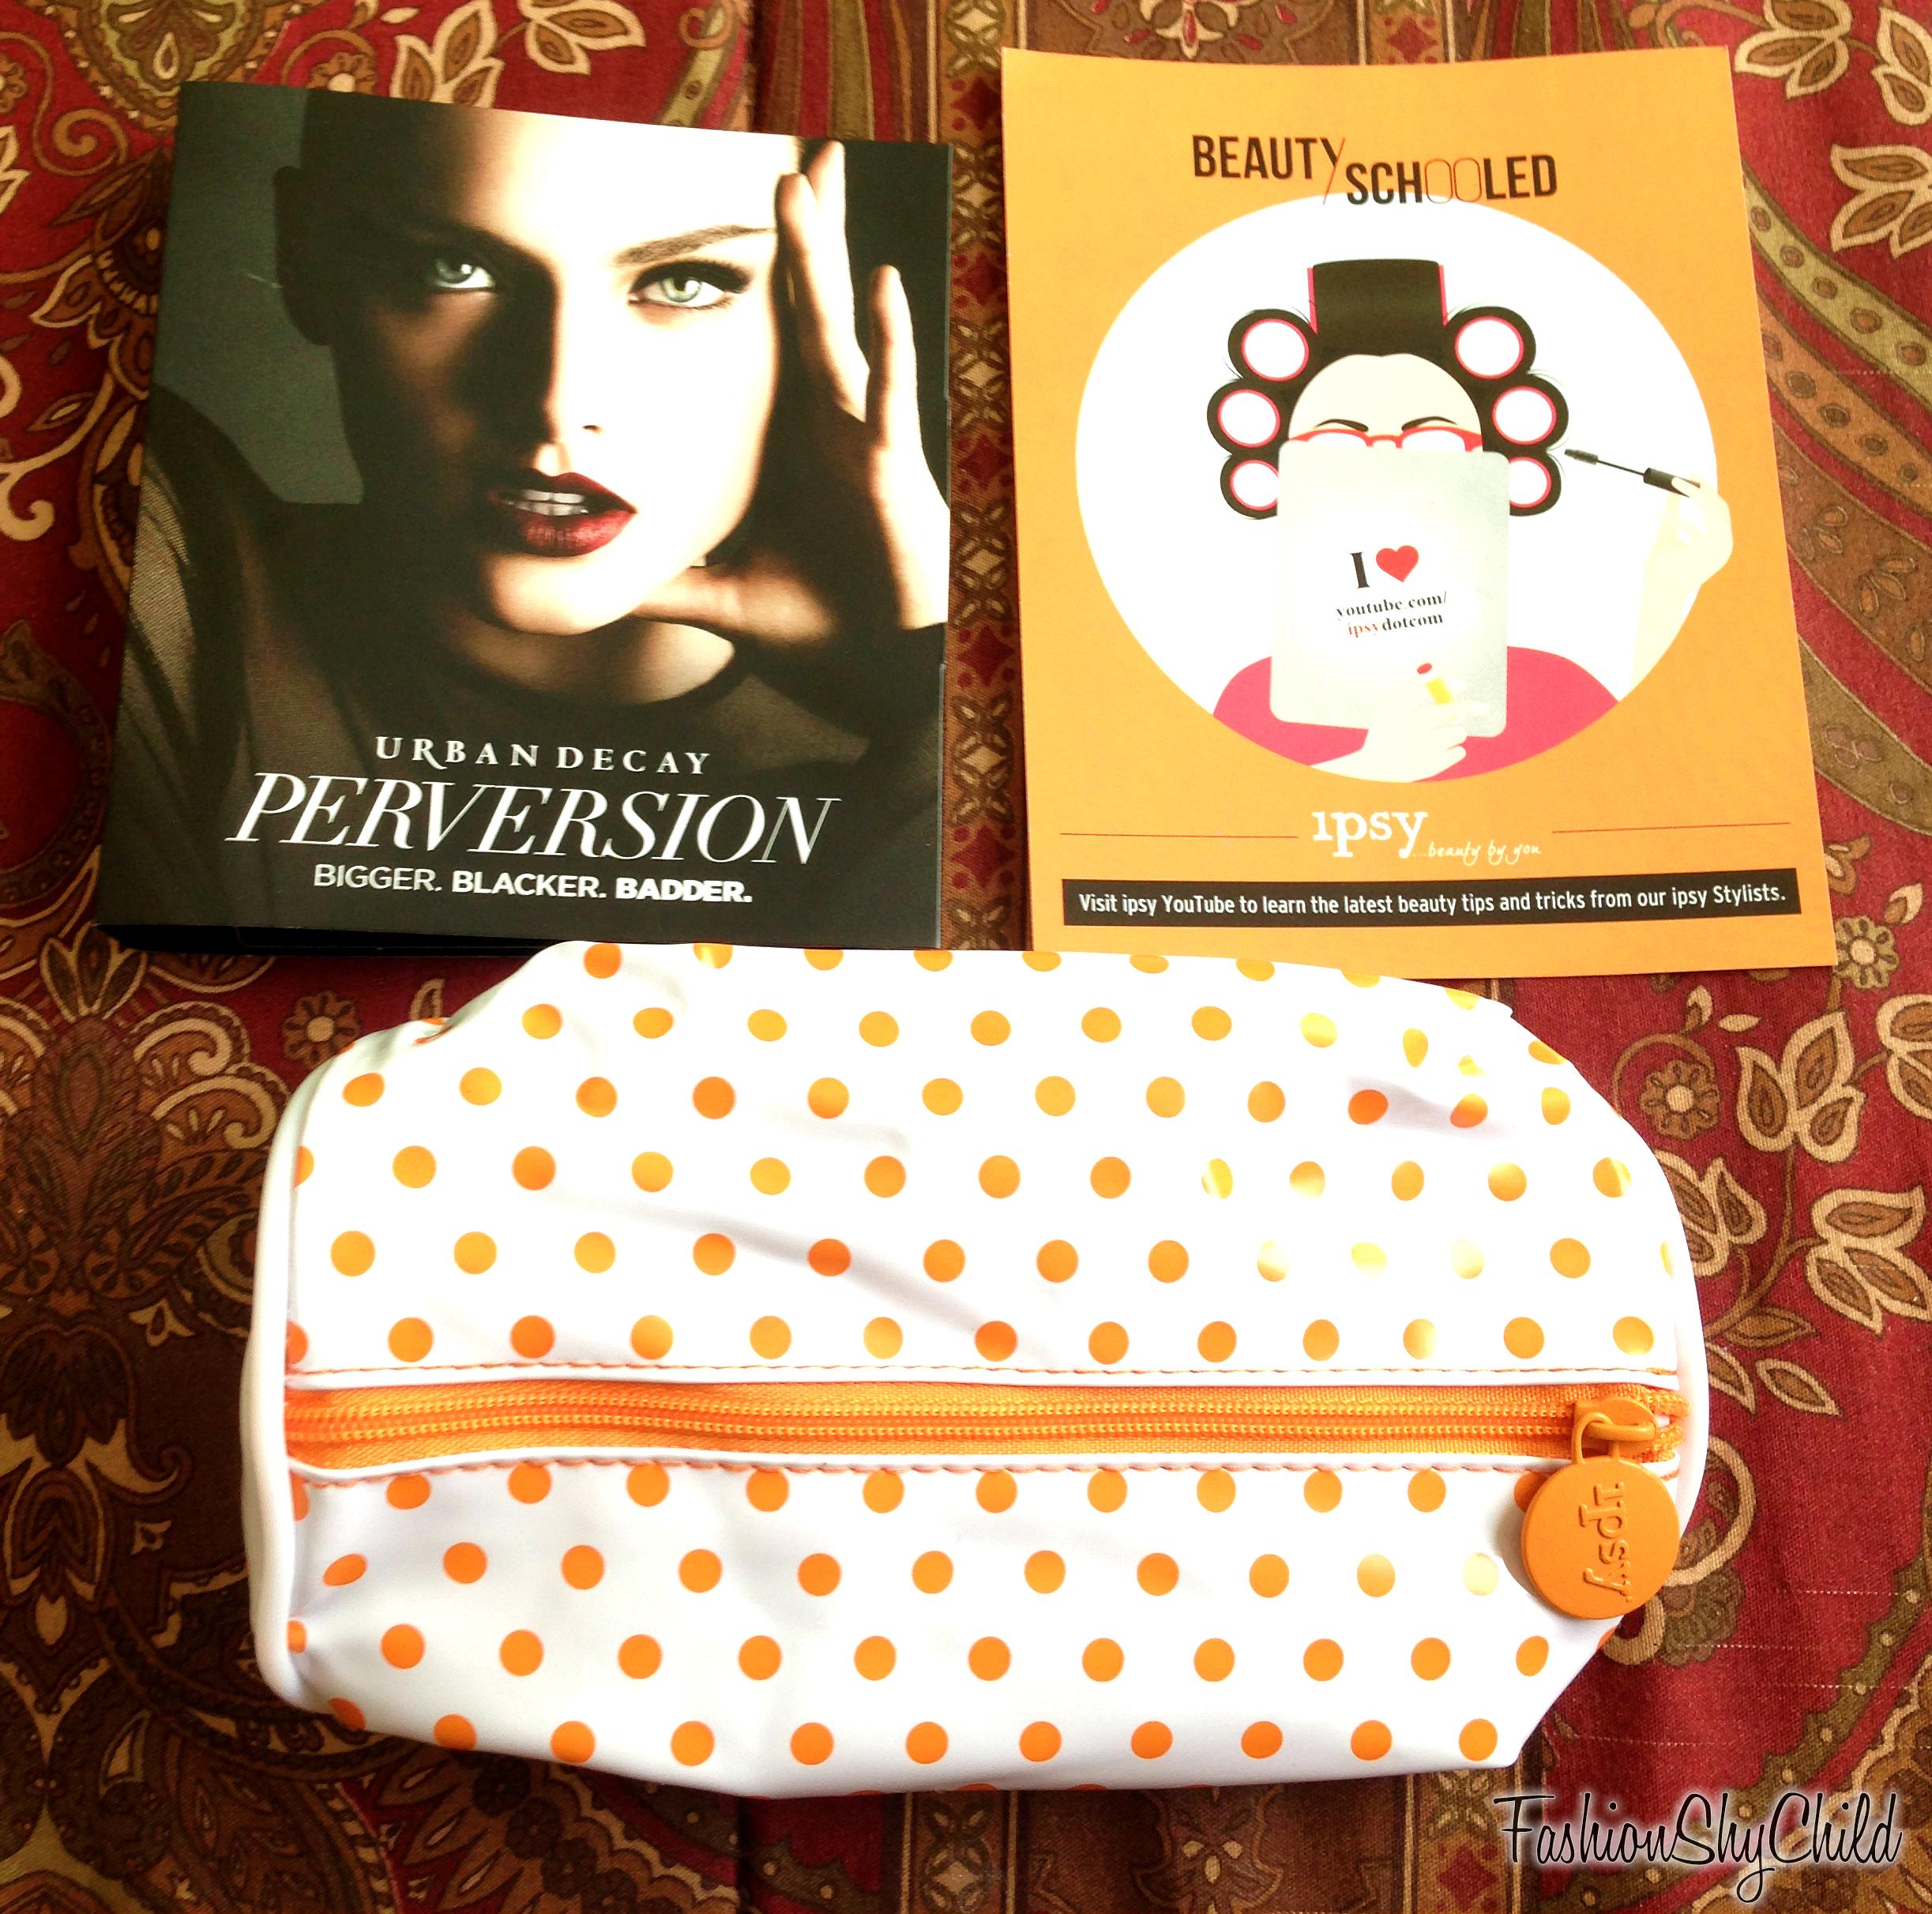 August 2014 Ipsy Bag